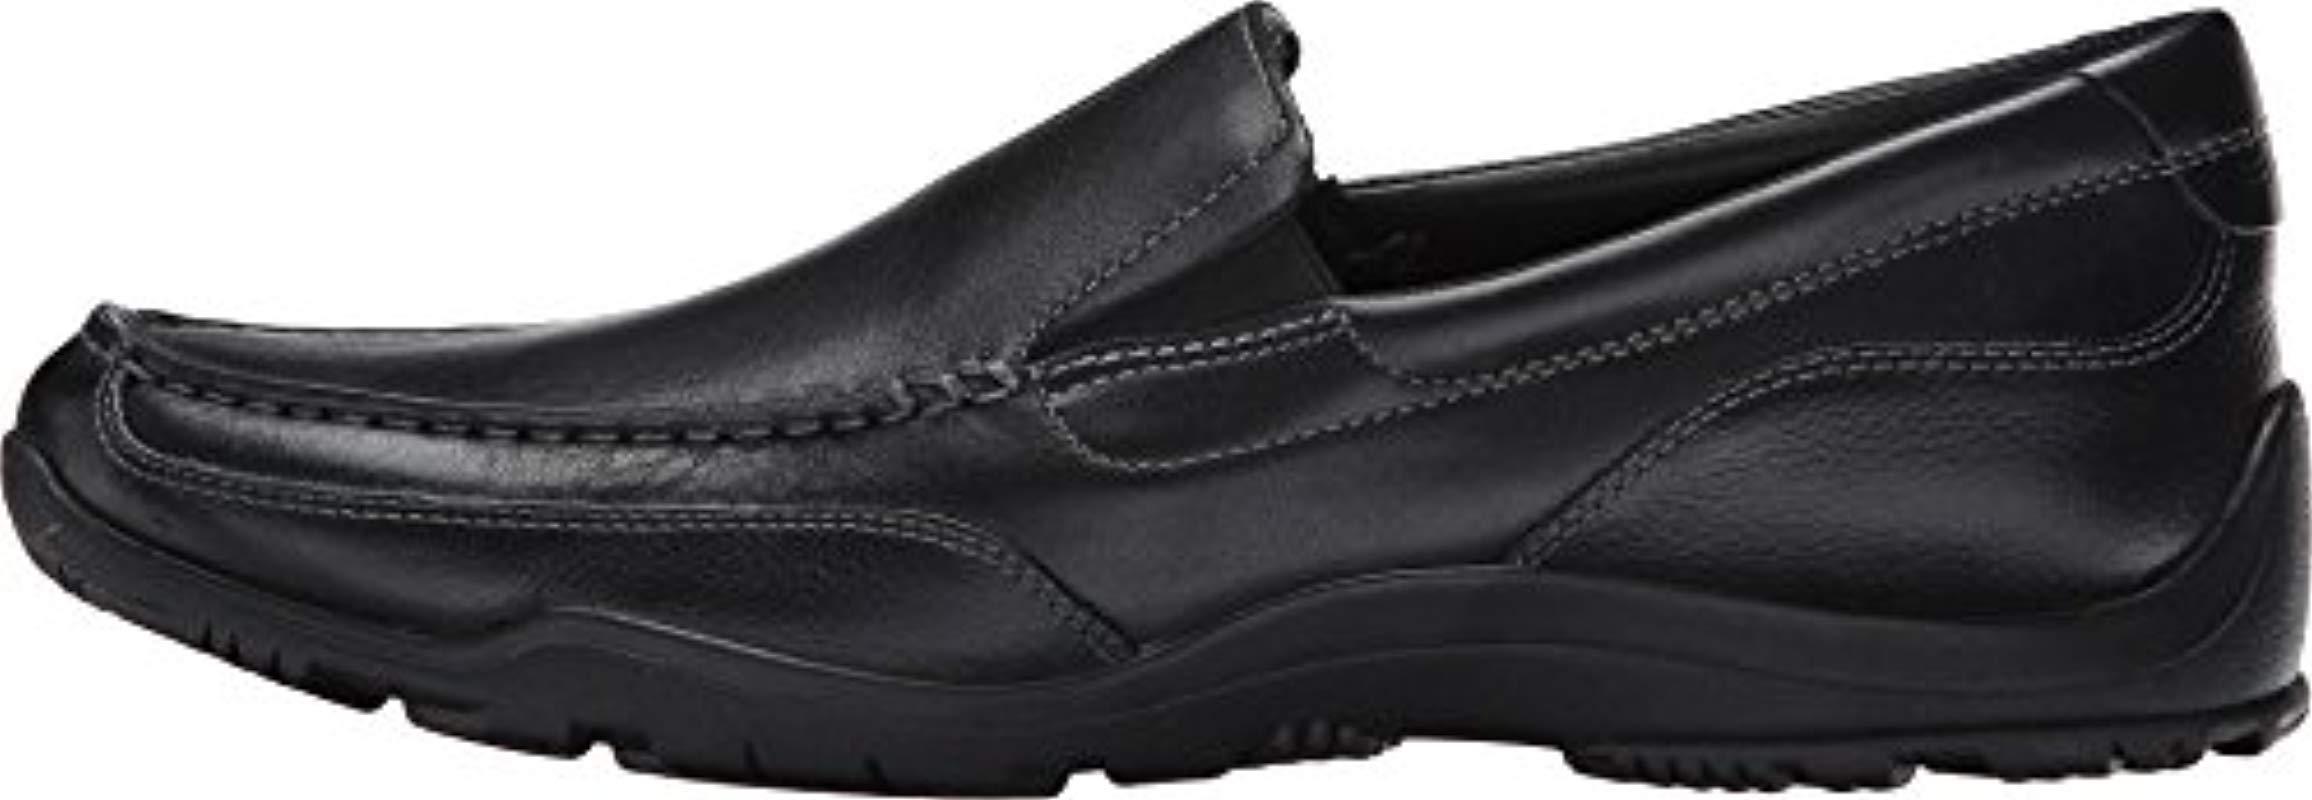 02b555df2c2 Cole Haan - Black Hughes Grand Vntn Ii Slip-on Loafer for Men - Lyst. View  fullscreen